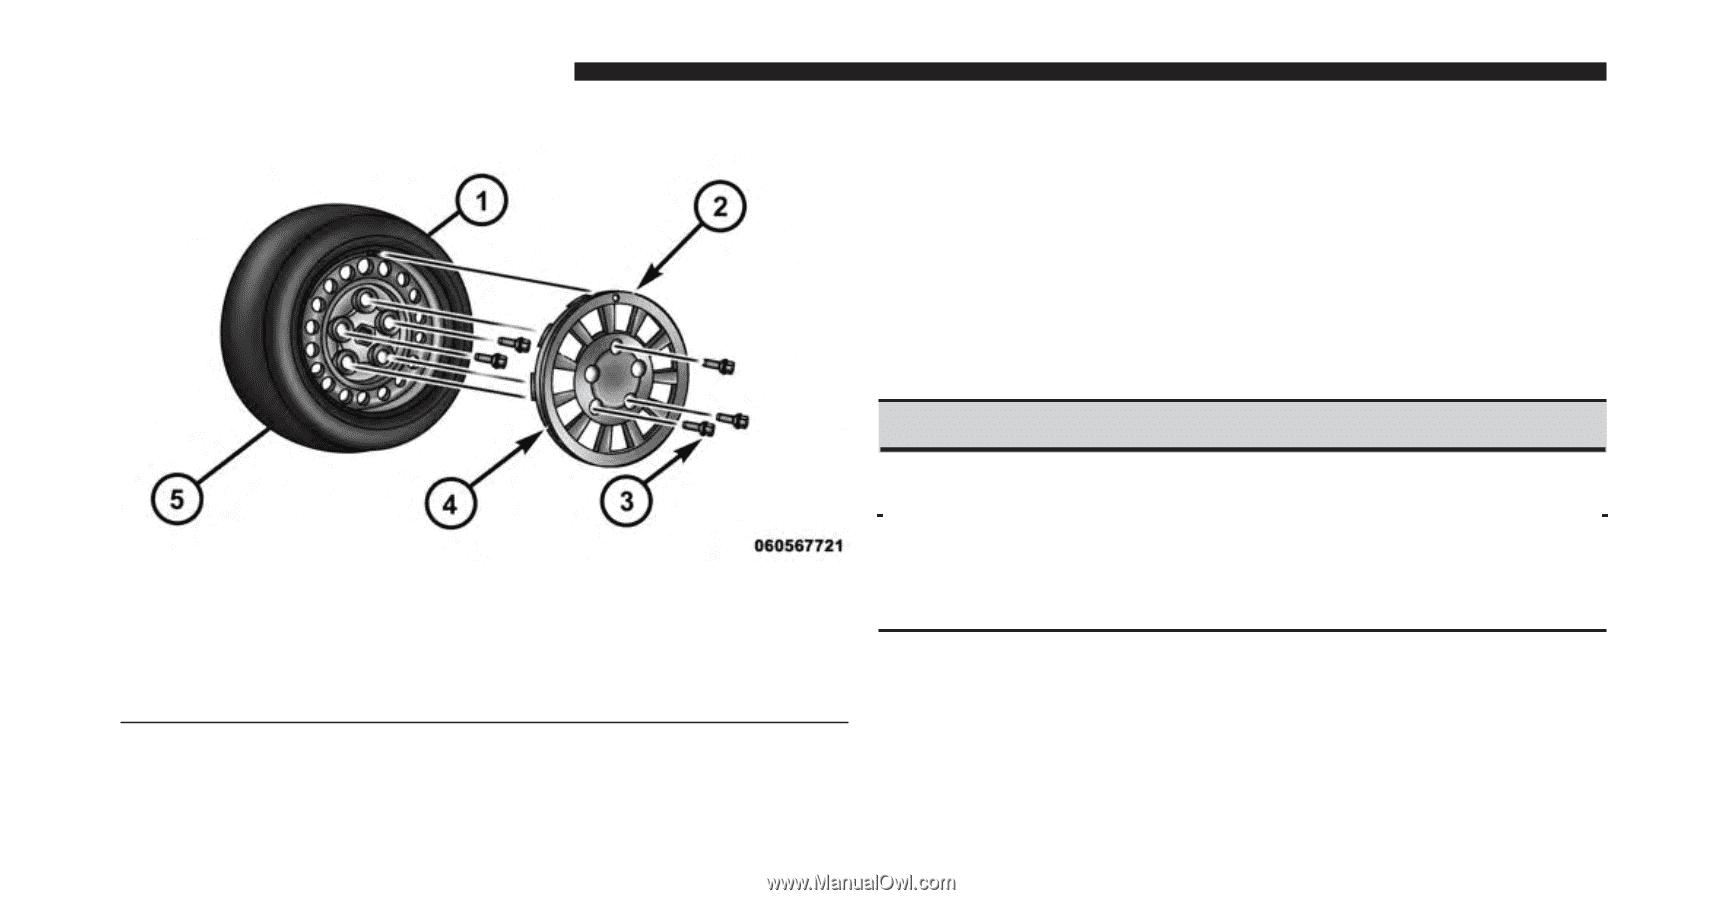 Toyota Tacoma 2015-2018 Service Manual: Ambient Temperature Sensor Circuit (B141212)